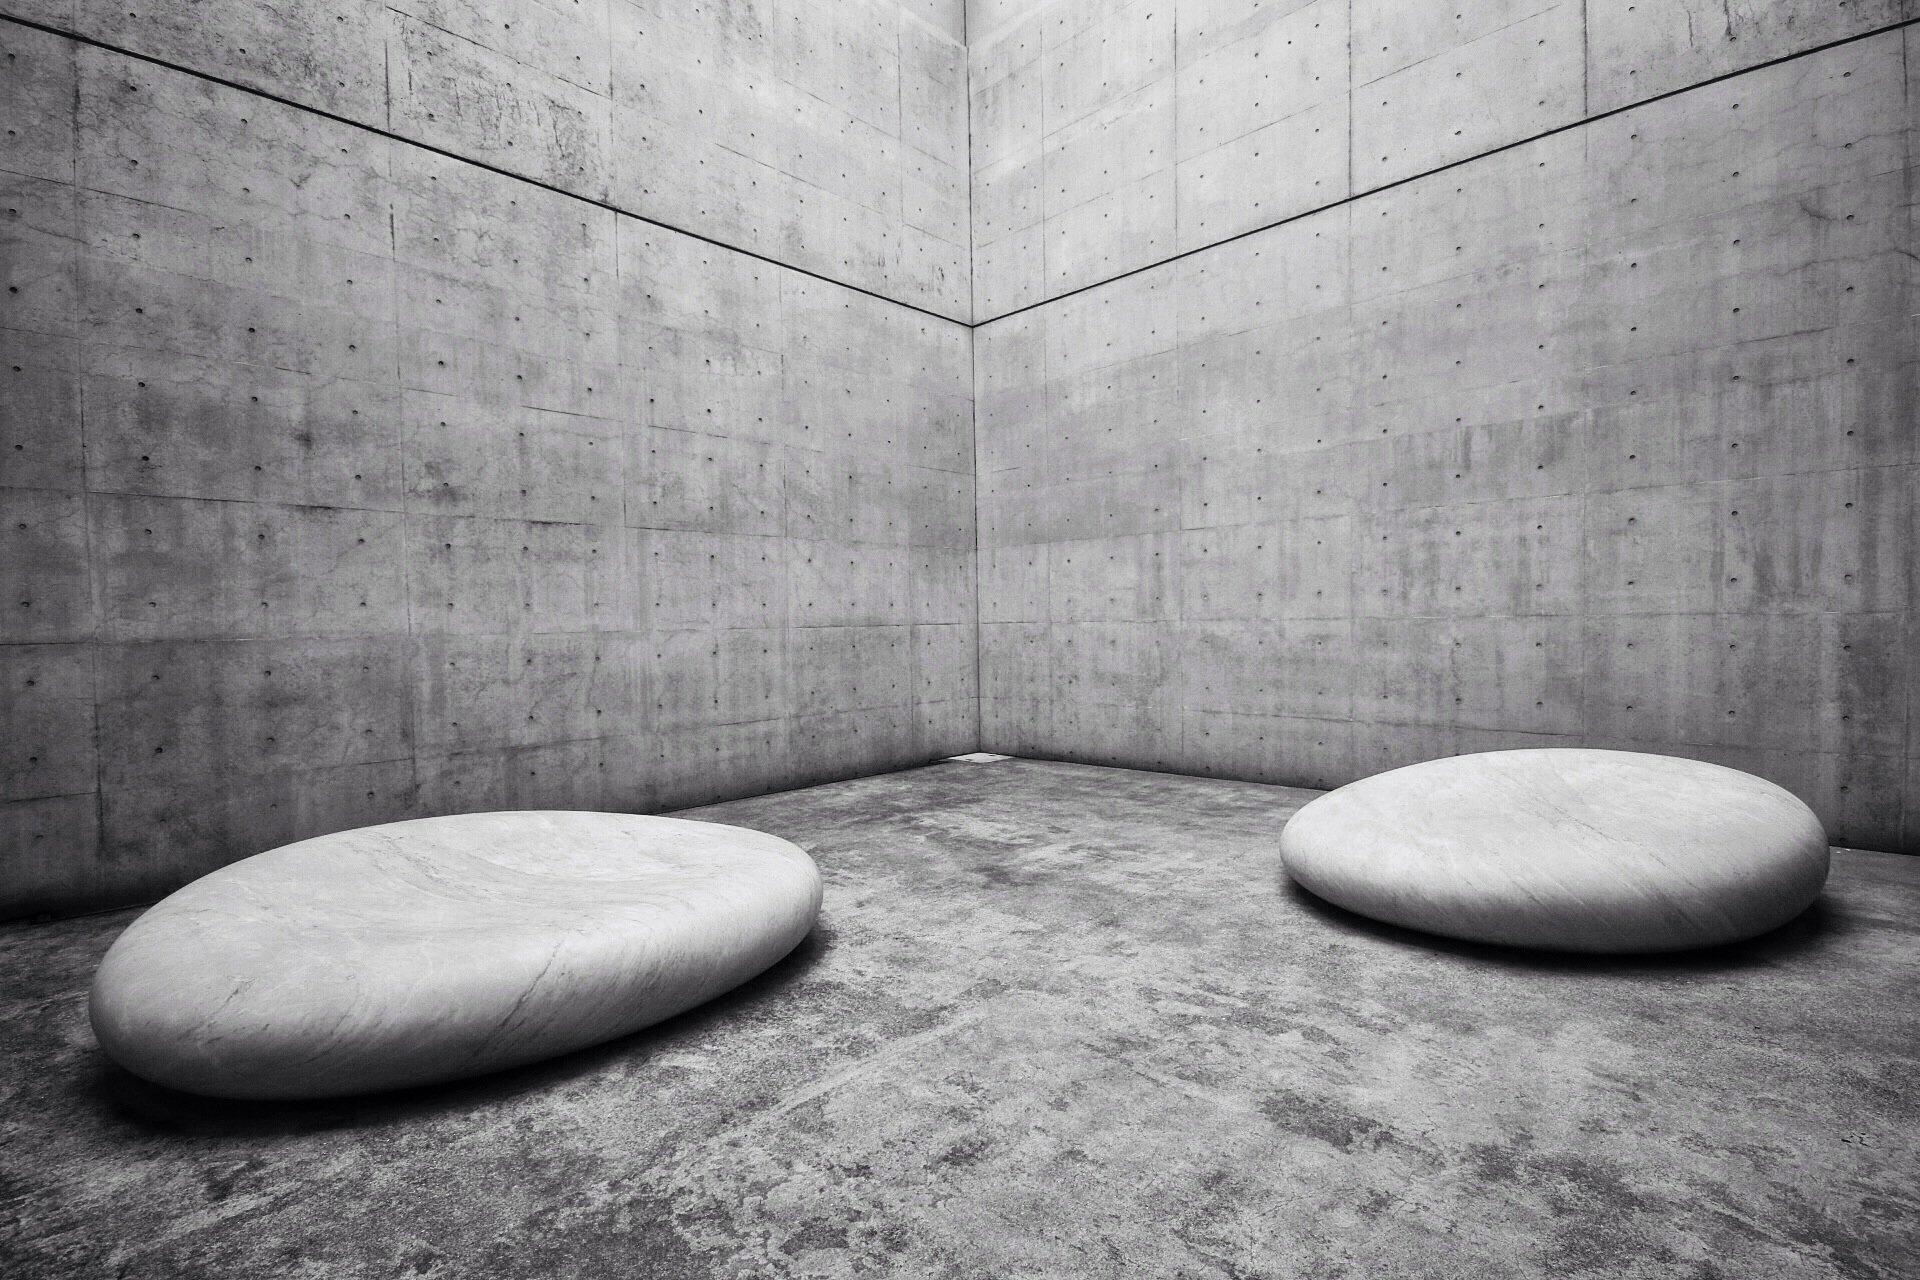 naoshima-benessen-house-kasuma-photo-blog